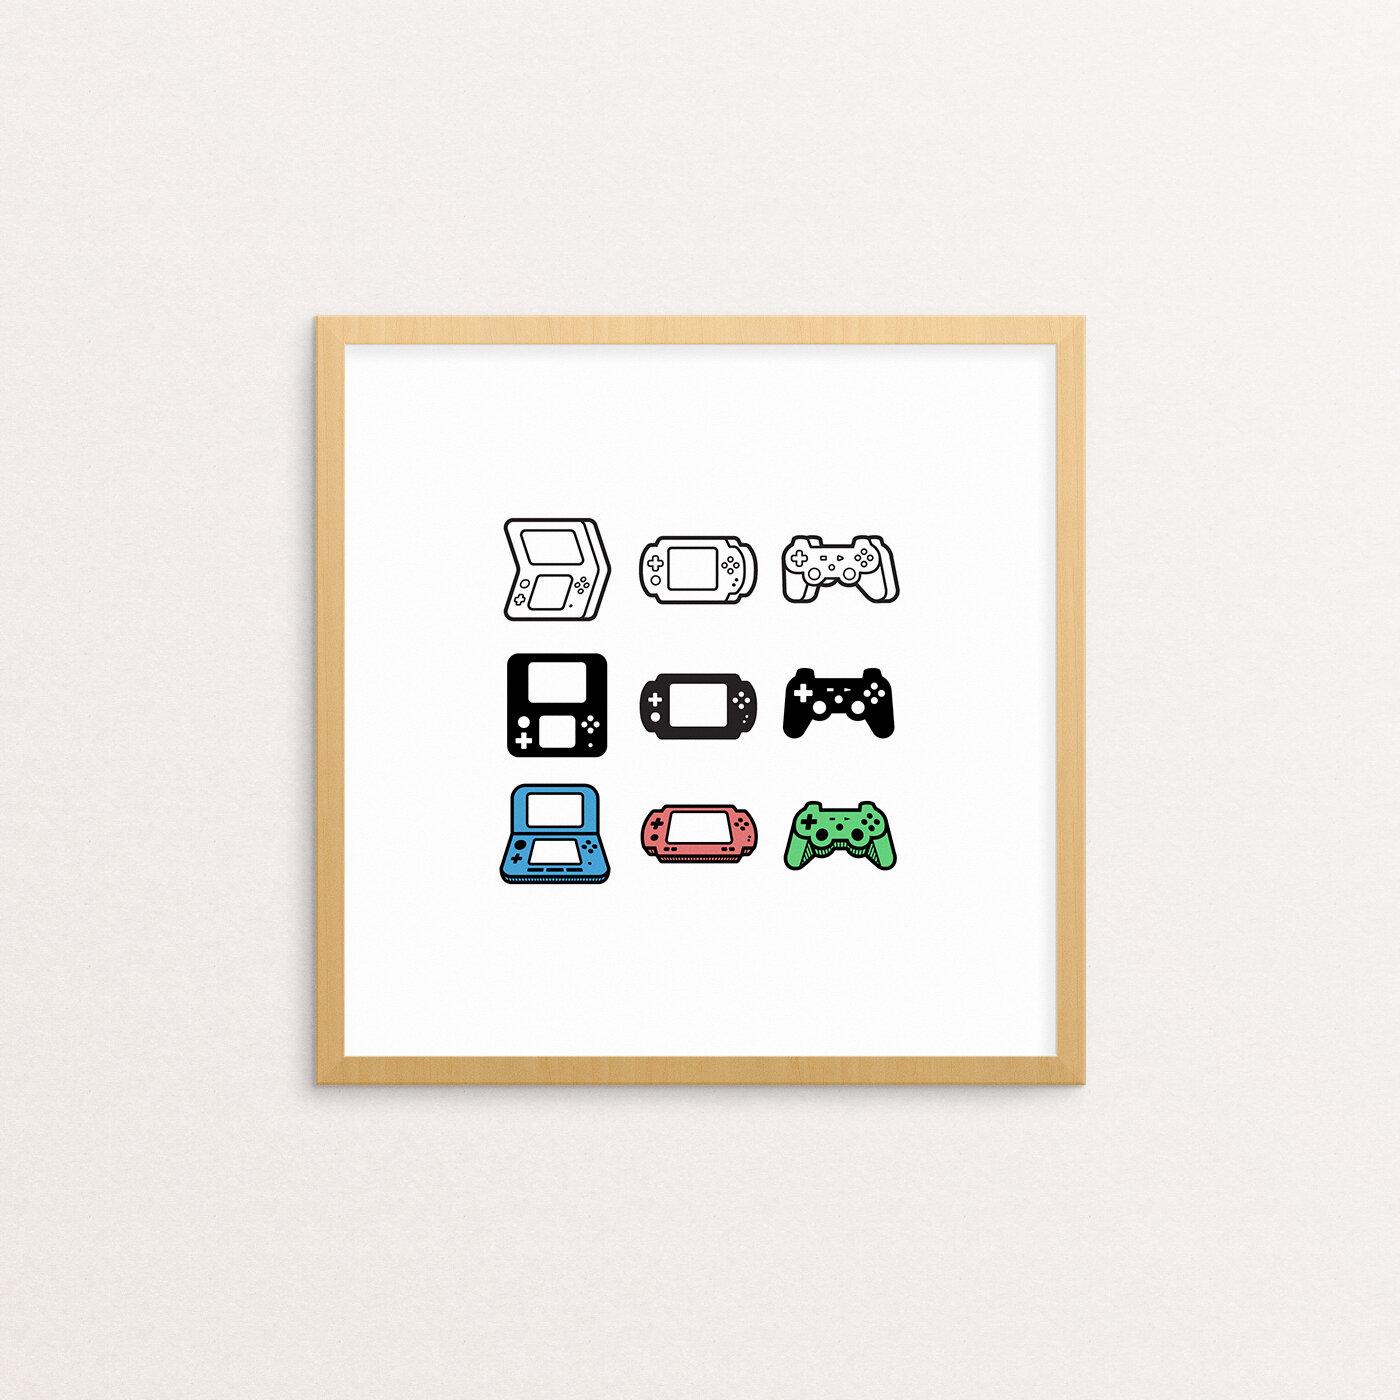 Game Icons.jpg